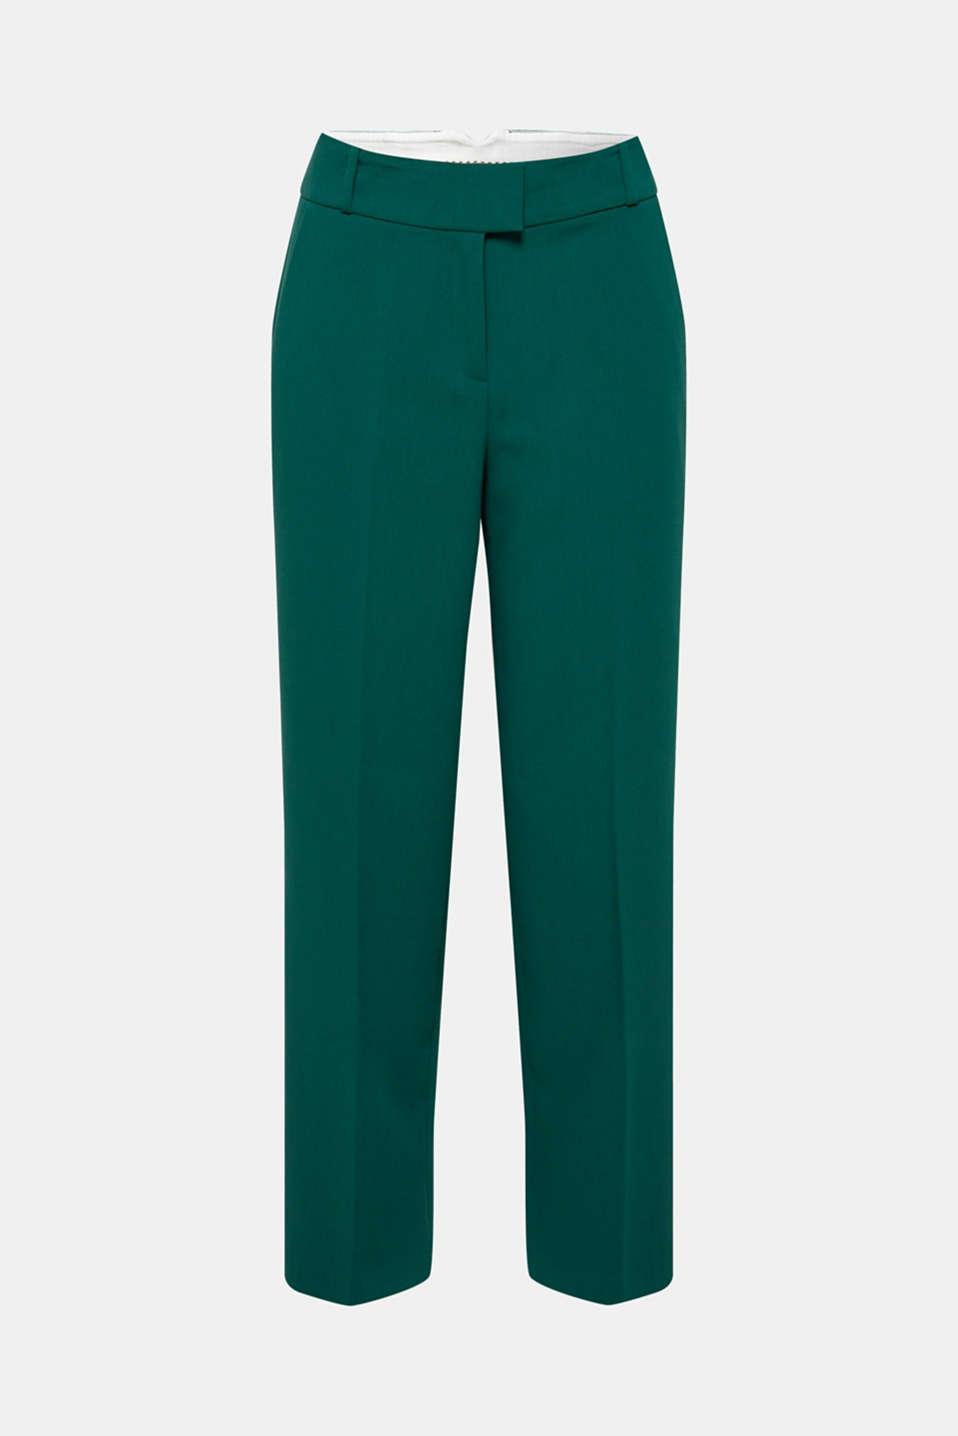 Pants woven, DARK TEAL GREEN, detail image number 7